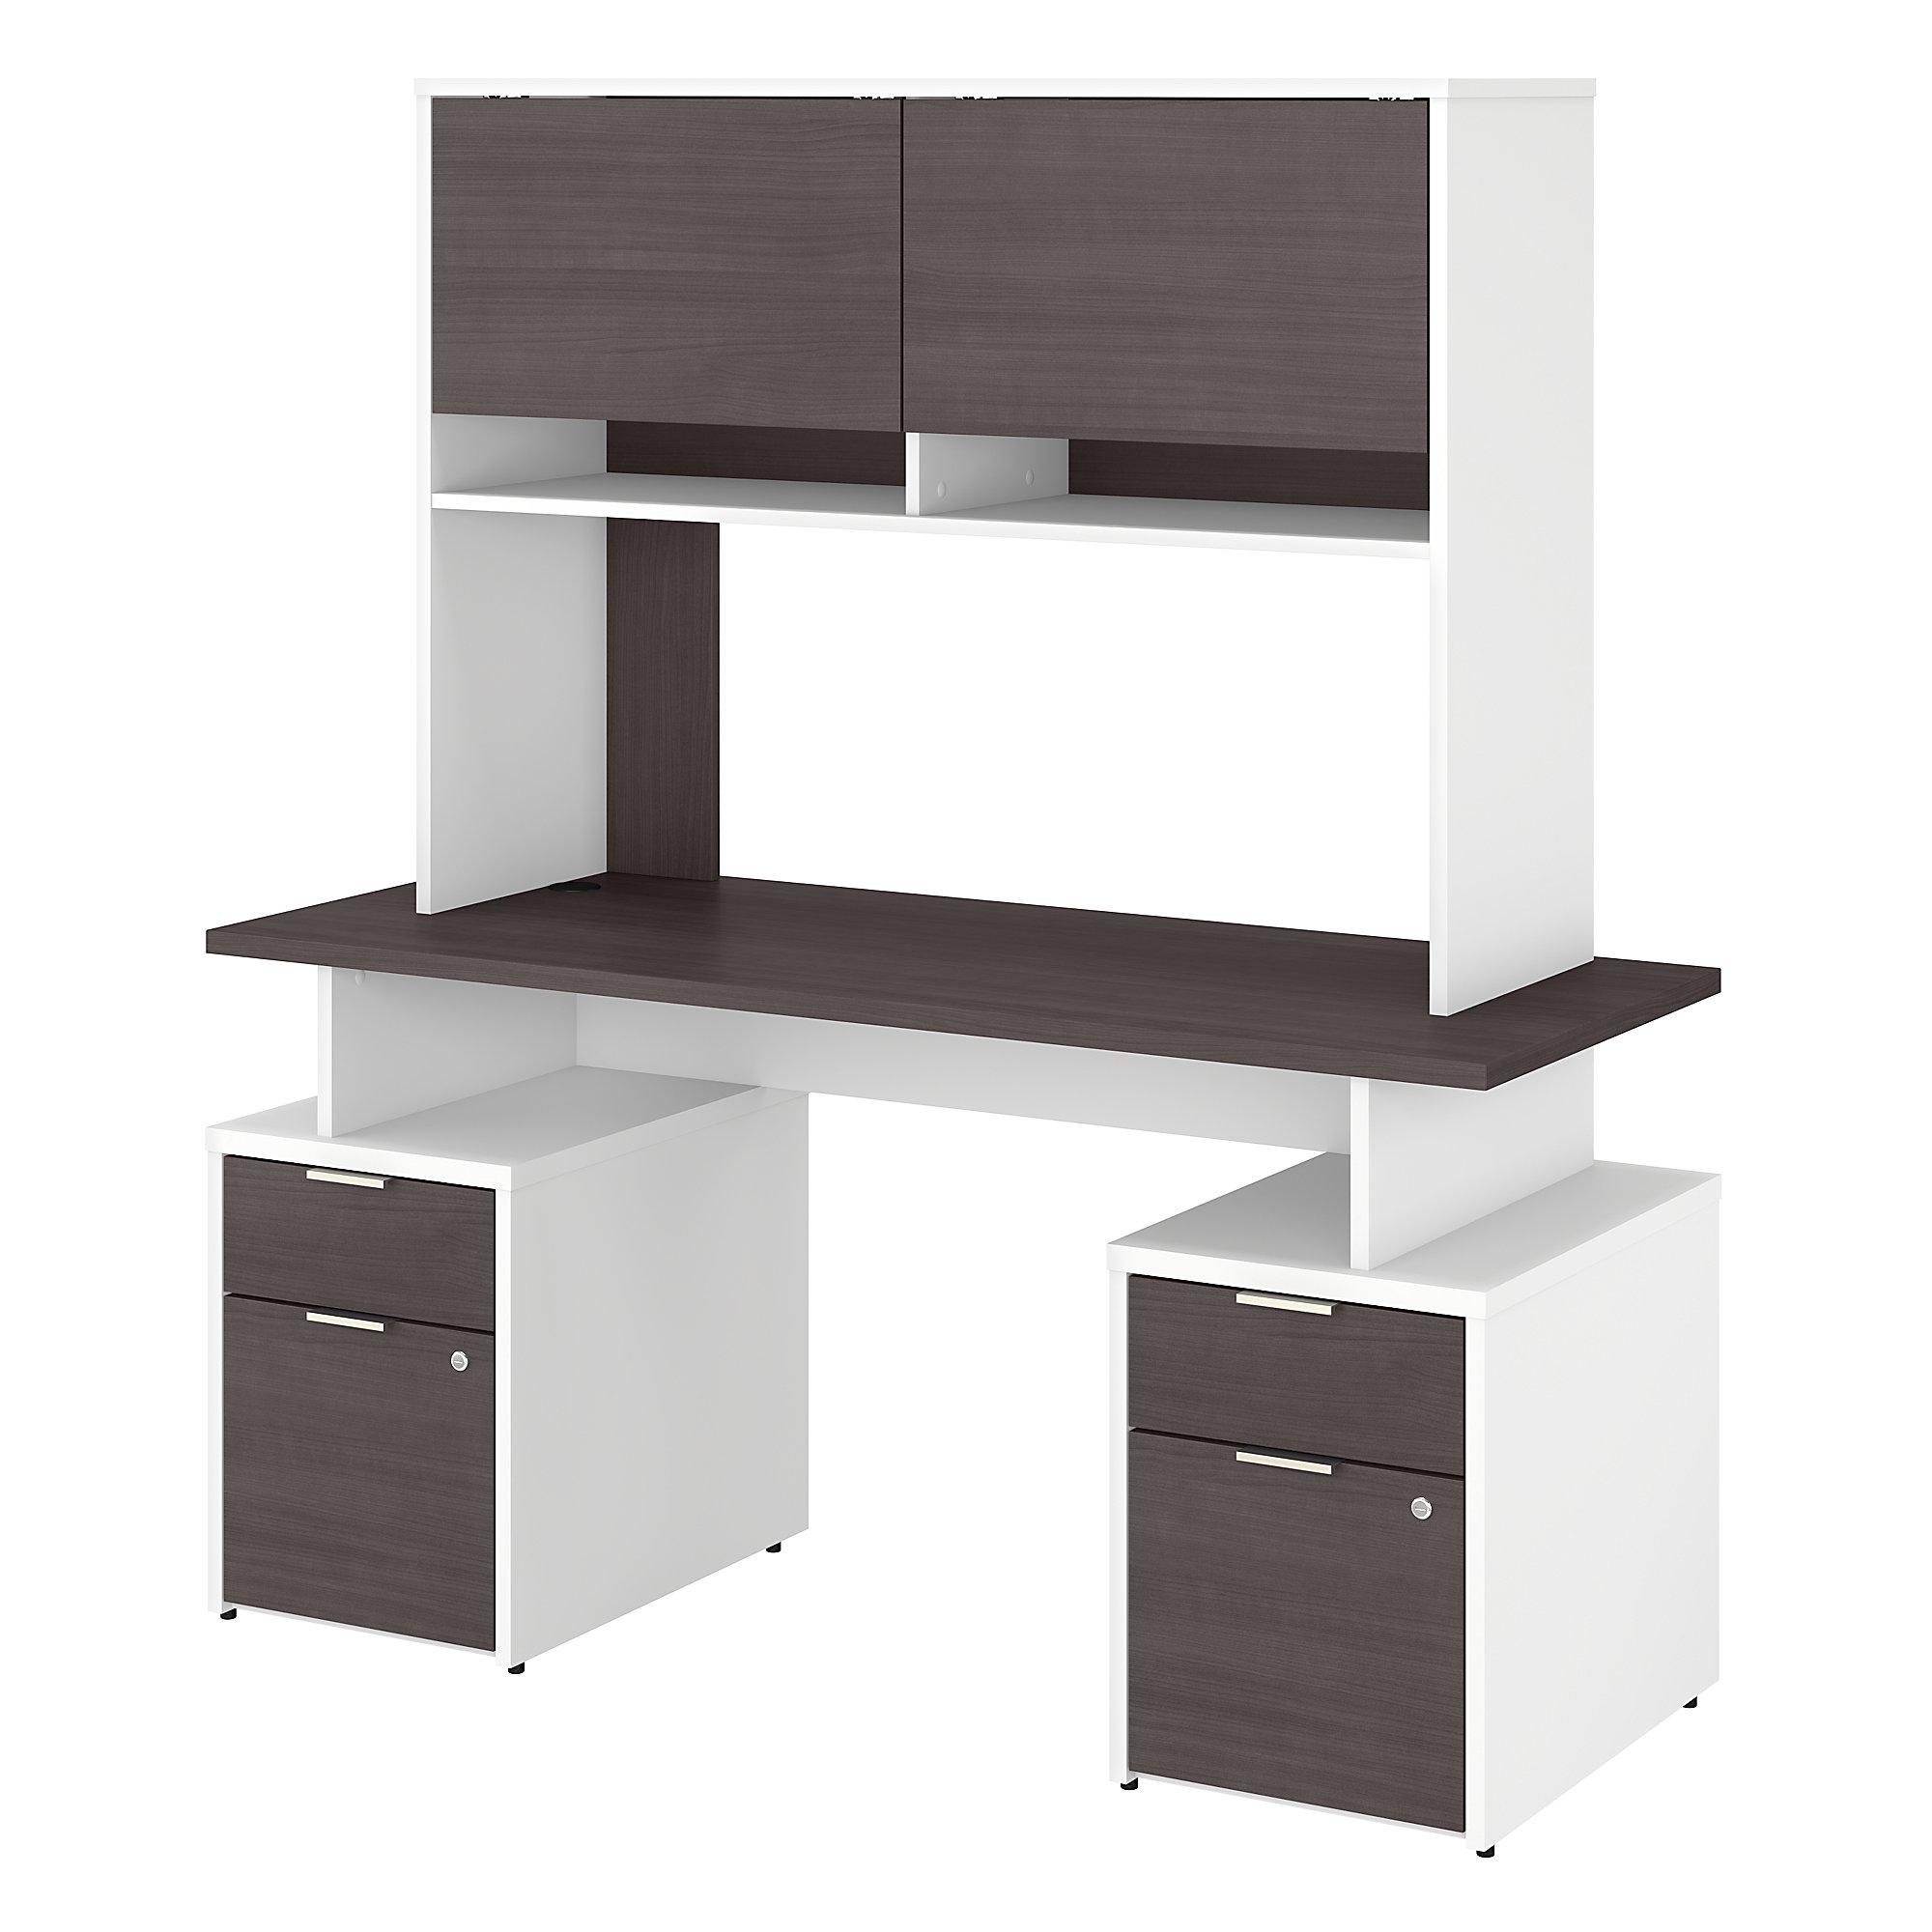 jamestown jtn018 storm gray and white desk